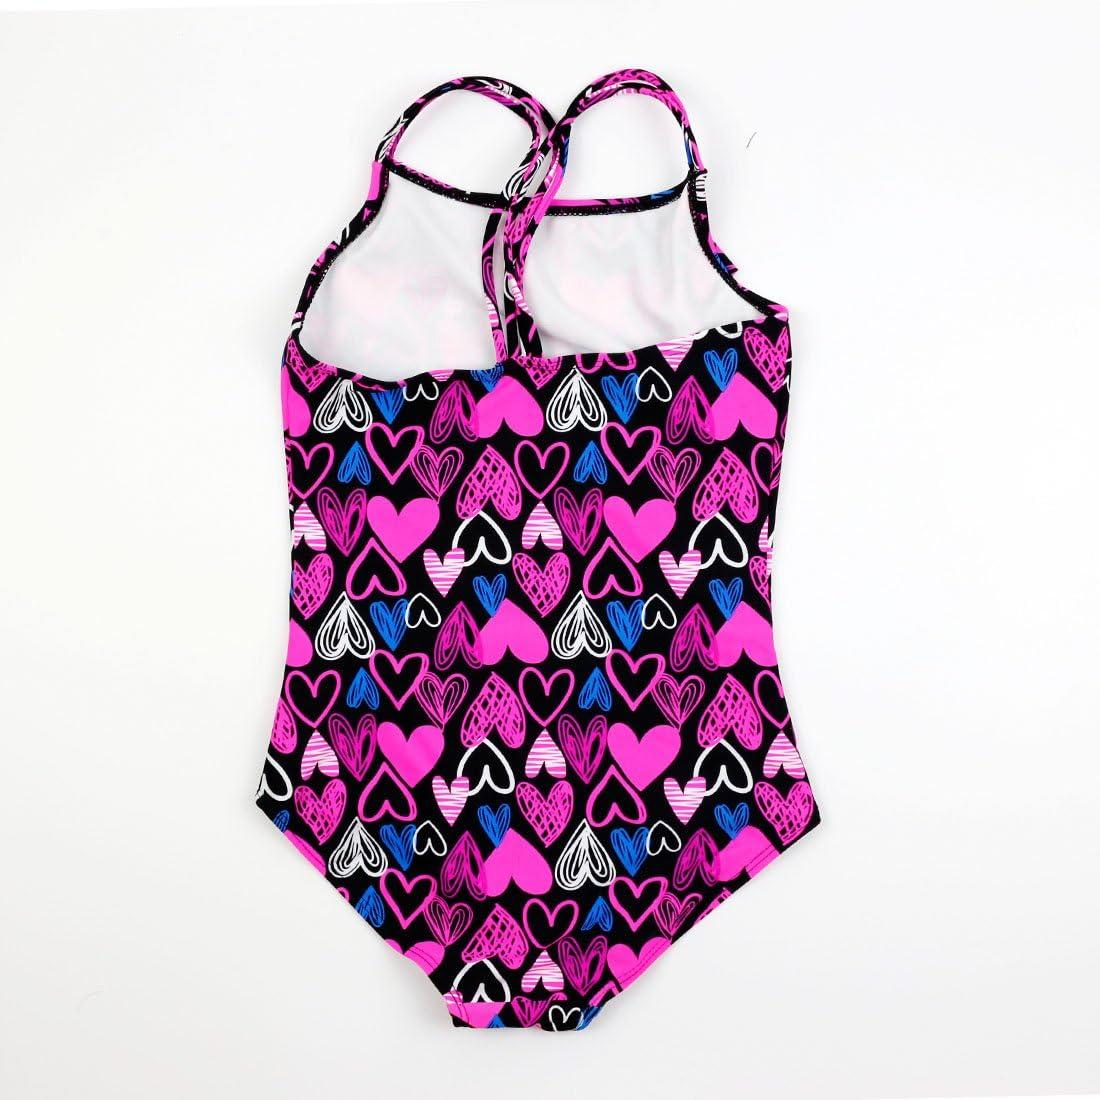 LOKTARC Girls One Piece Swimsuits Watermelon Print Frill Detail Swimwear